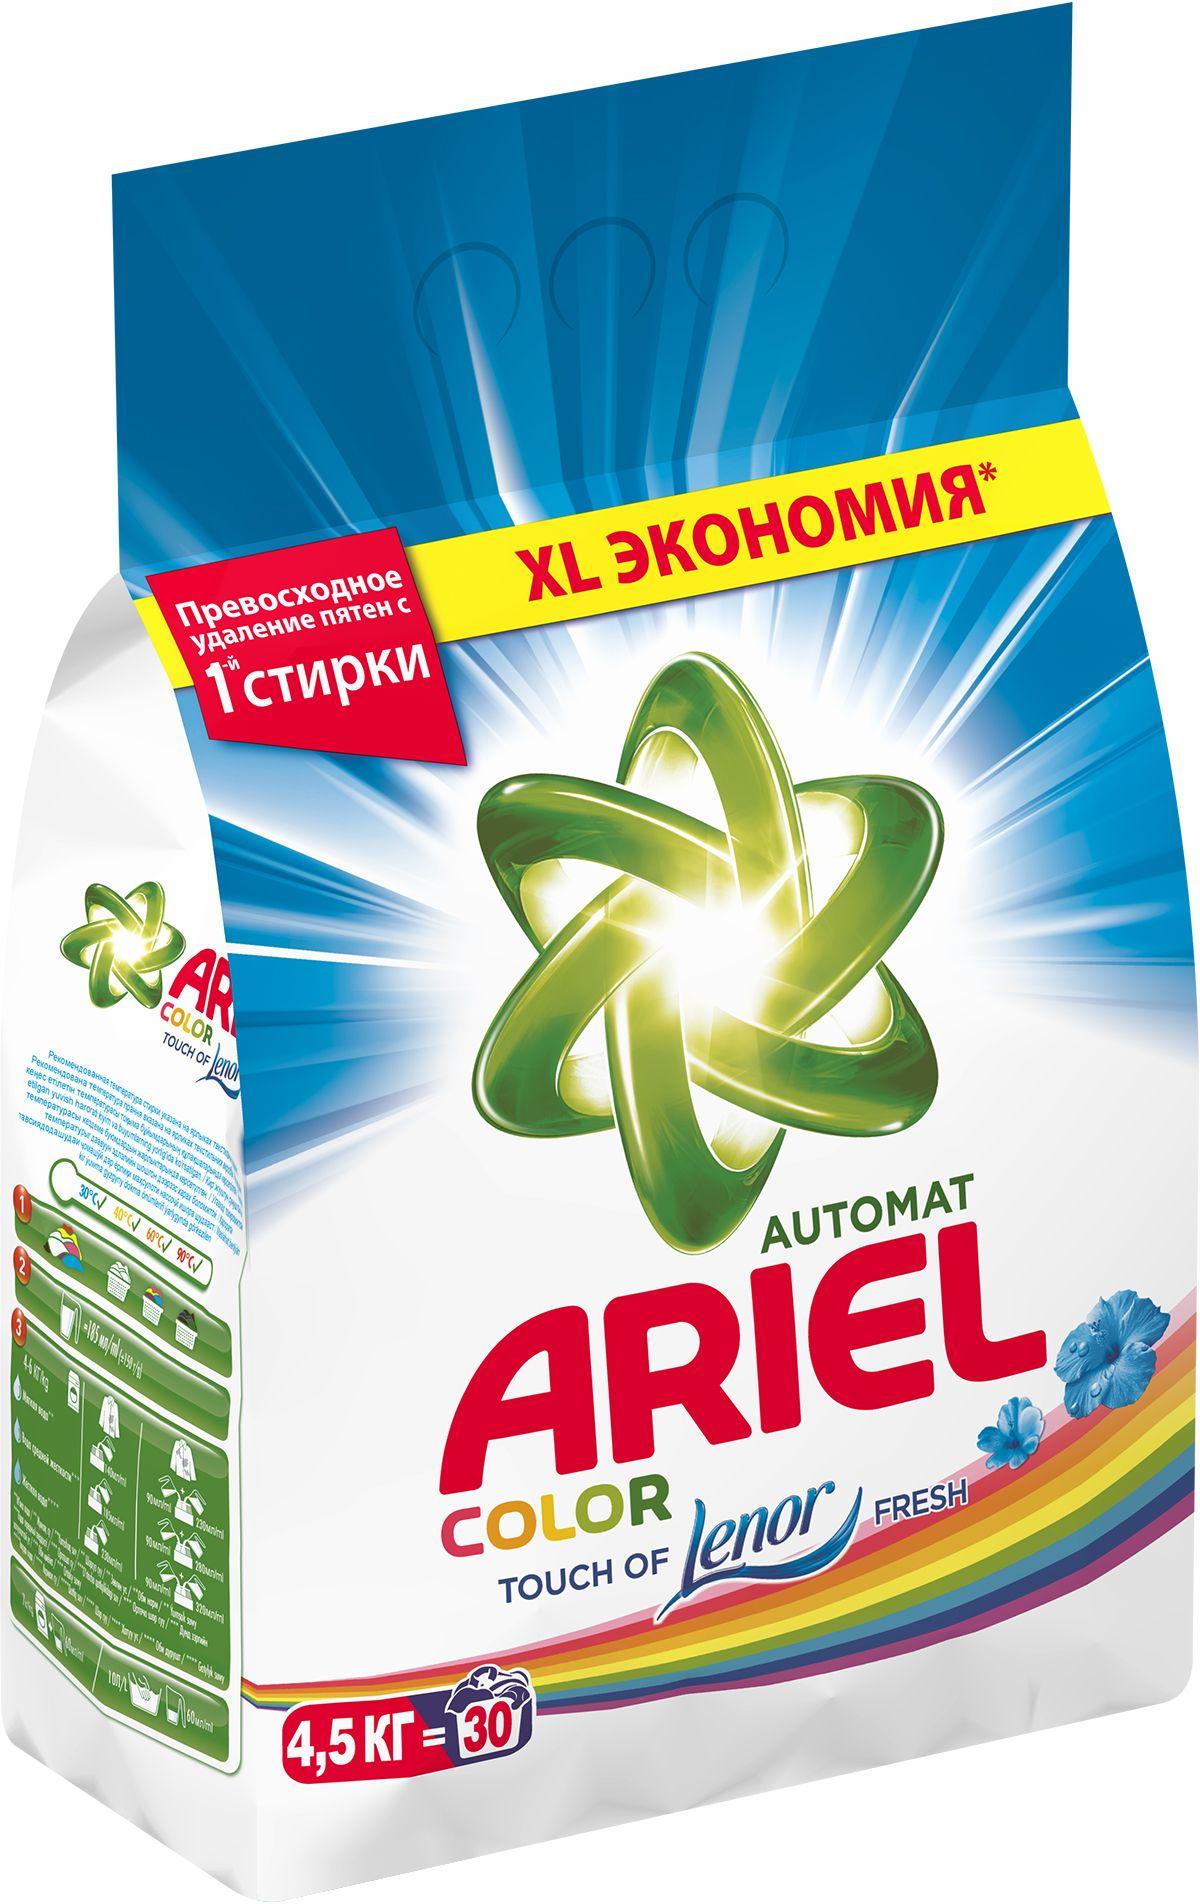 ariel ARIEL 2в1Color Lenor Effect4,5 кг Автомат (5410076120079)